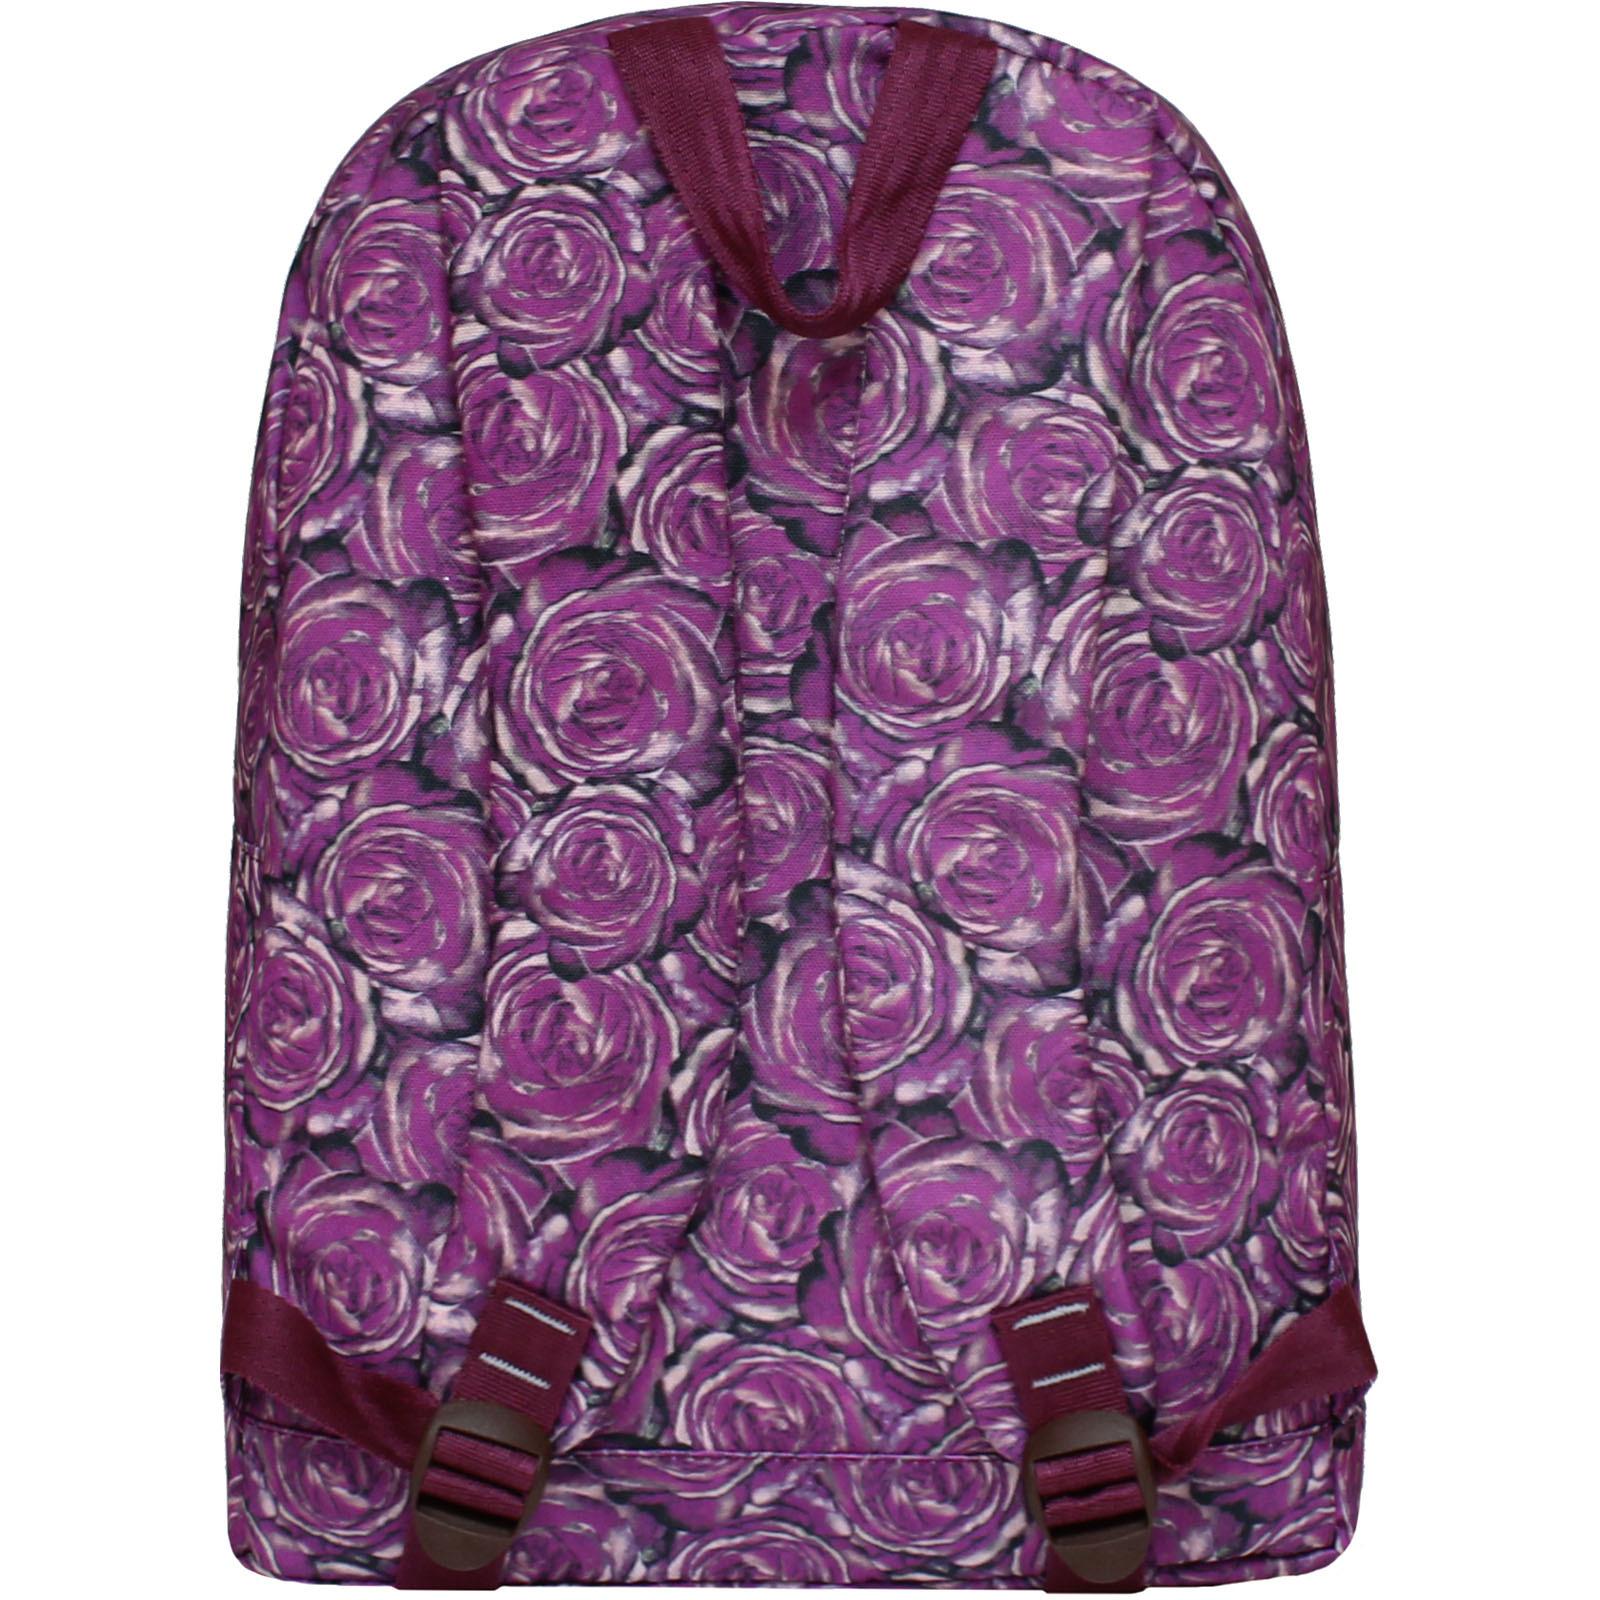 Рюкзак Bagland Молодежный (дизайн) 17 л. сублимация 155 (00533664)